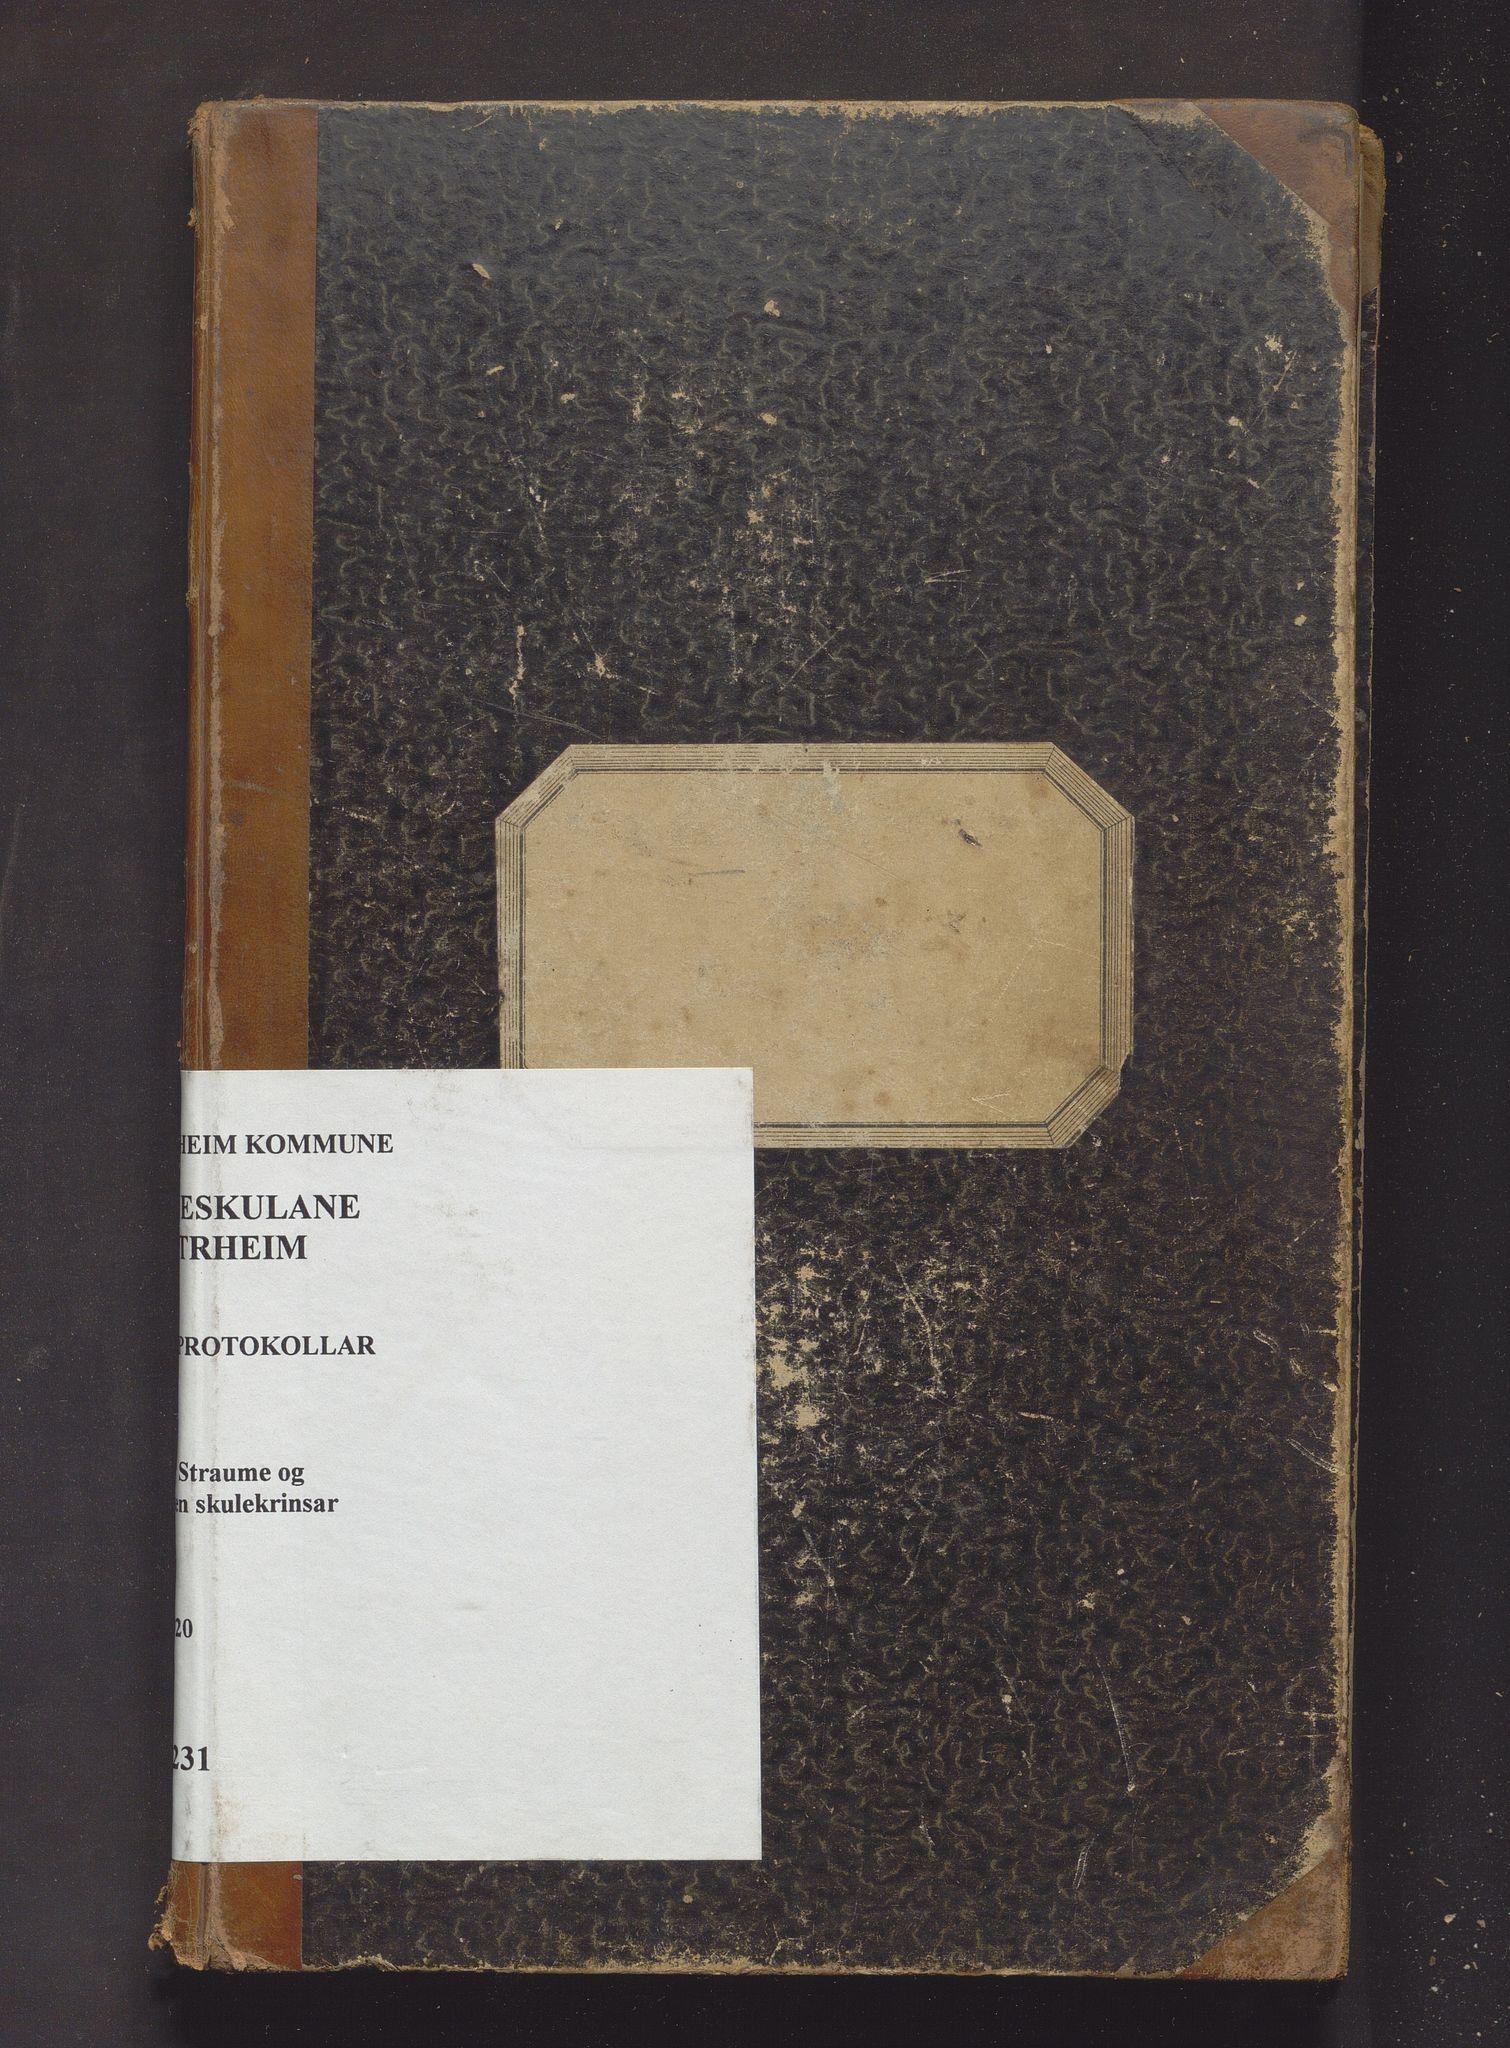 IKAH, Austrheim kommune. Barneskulane, F/Fa/L0013: Skuleprotokoll for Rebnor, Straume og Øygarden, 1900-1920